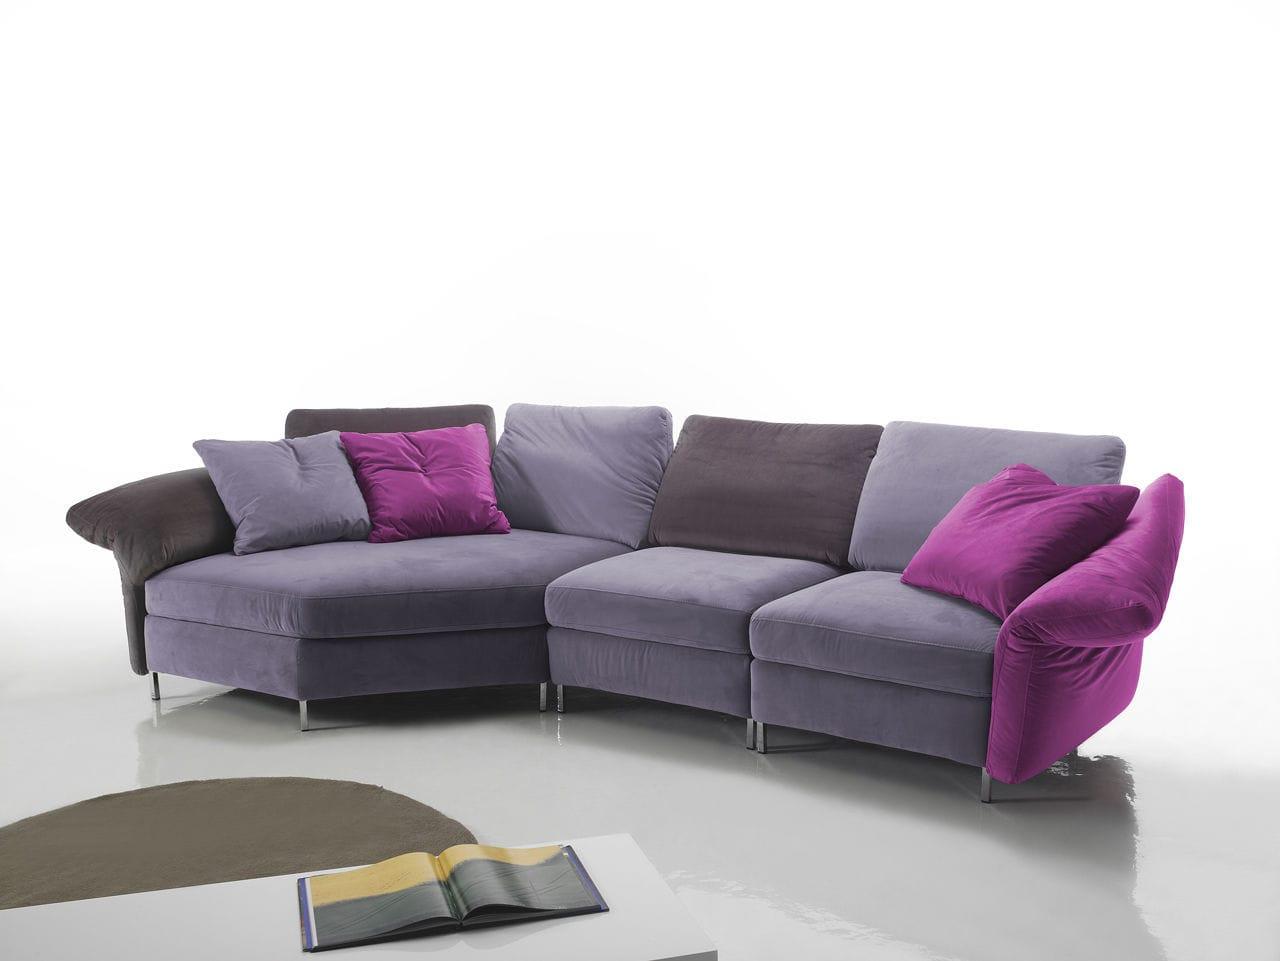 Divano 4 Posti.Divano Modulare Moderno In Tessuto 4 Posti Flower Very Sofa